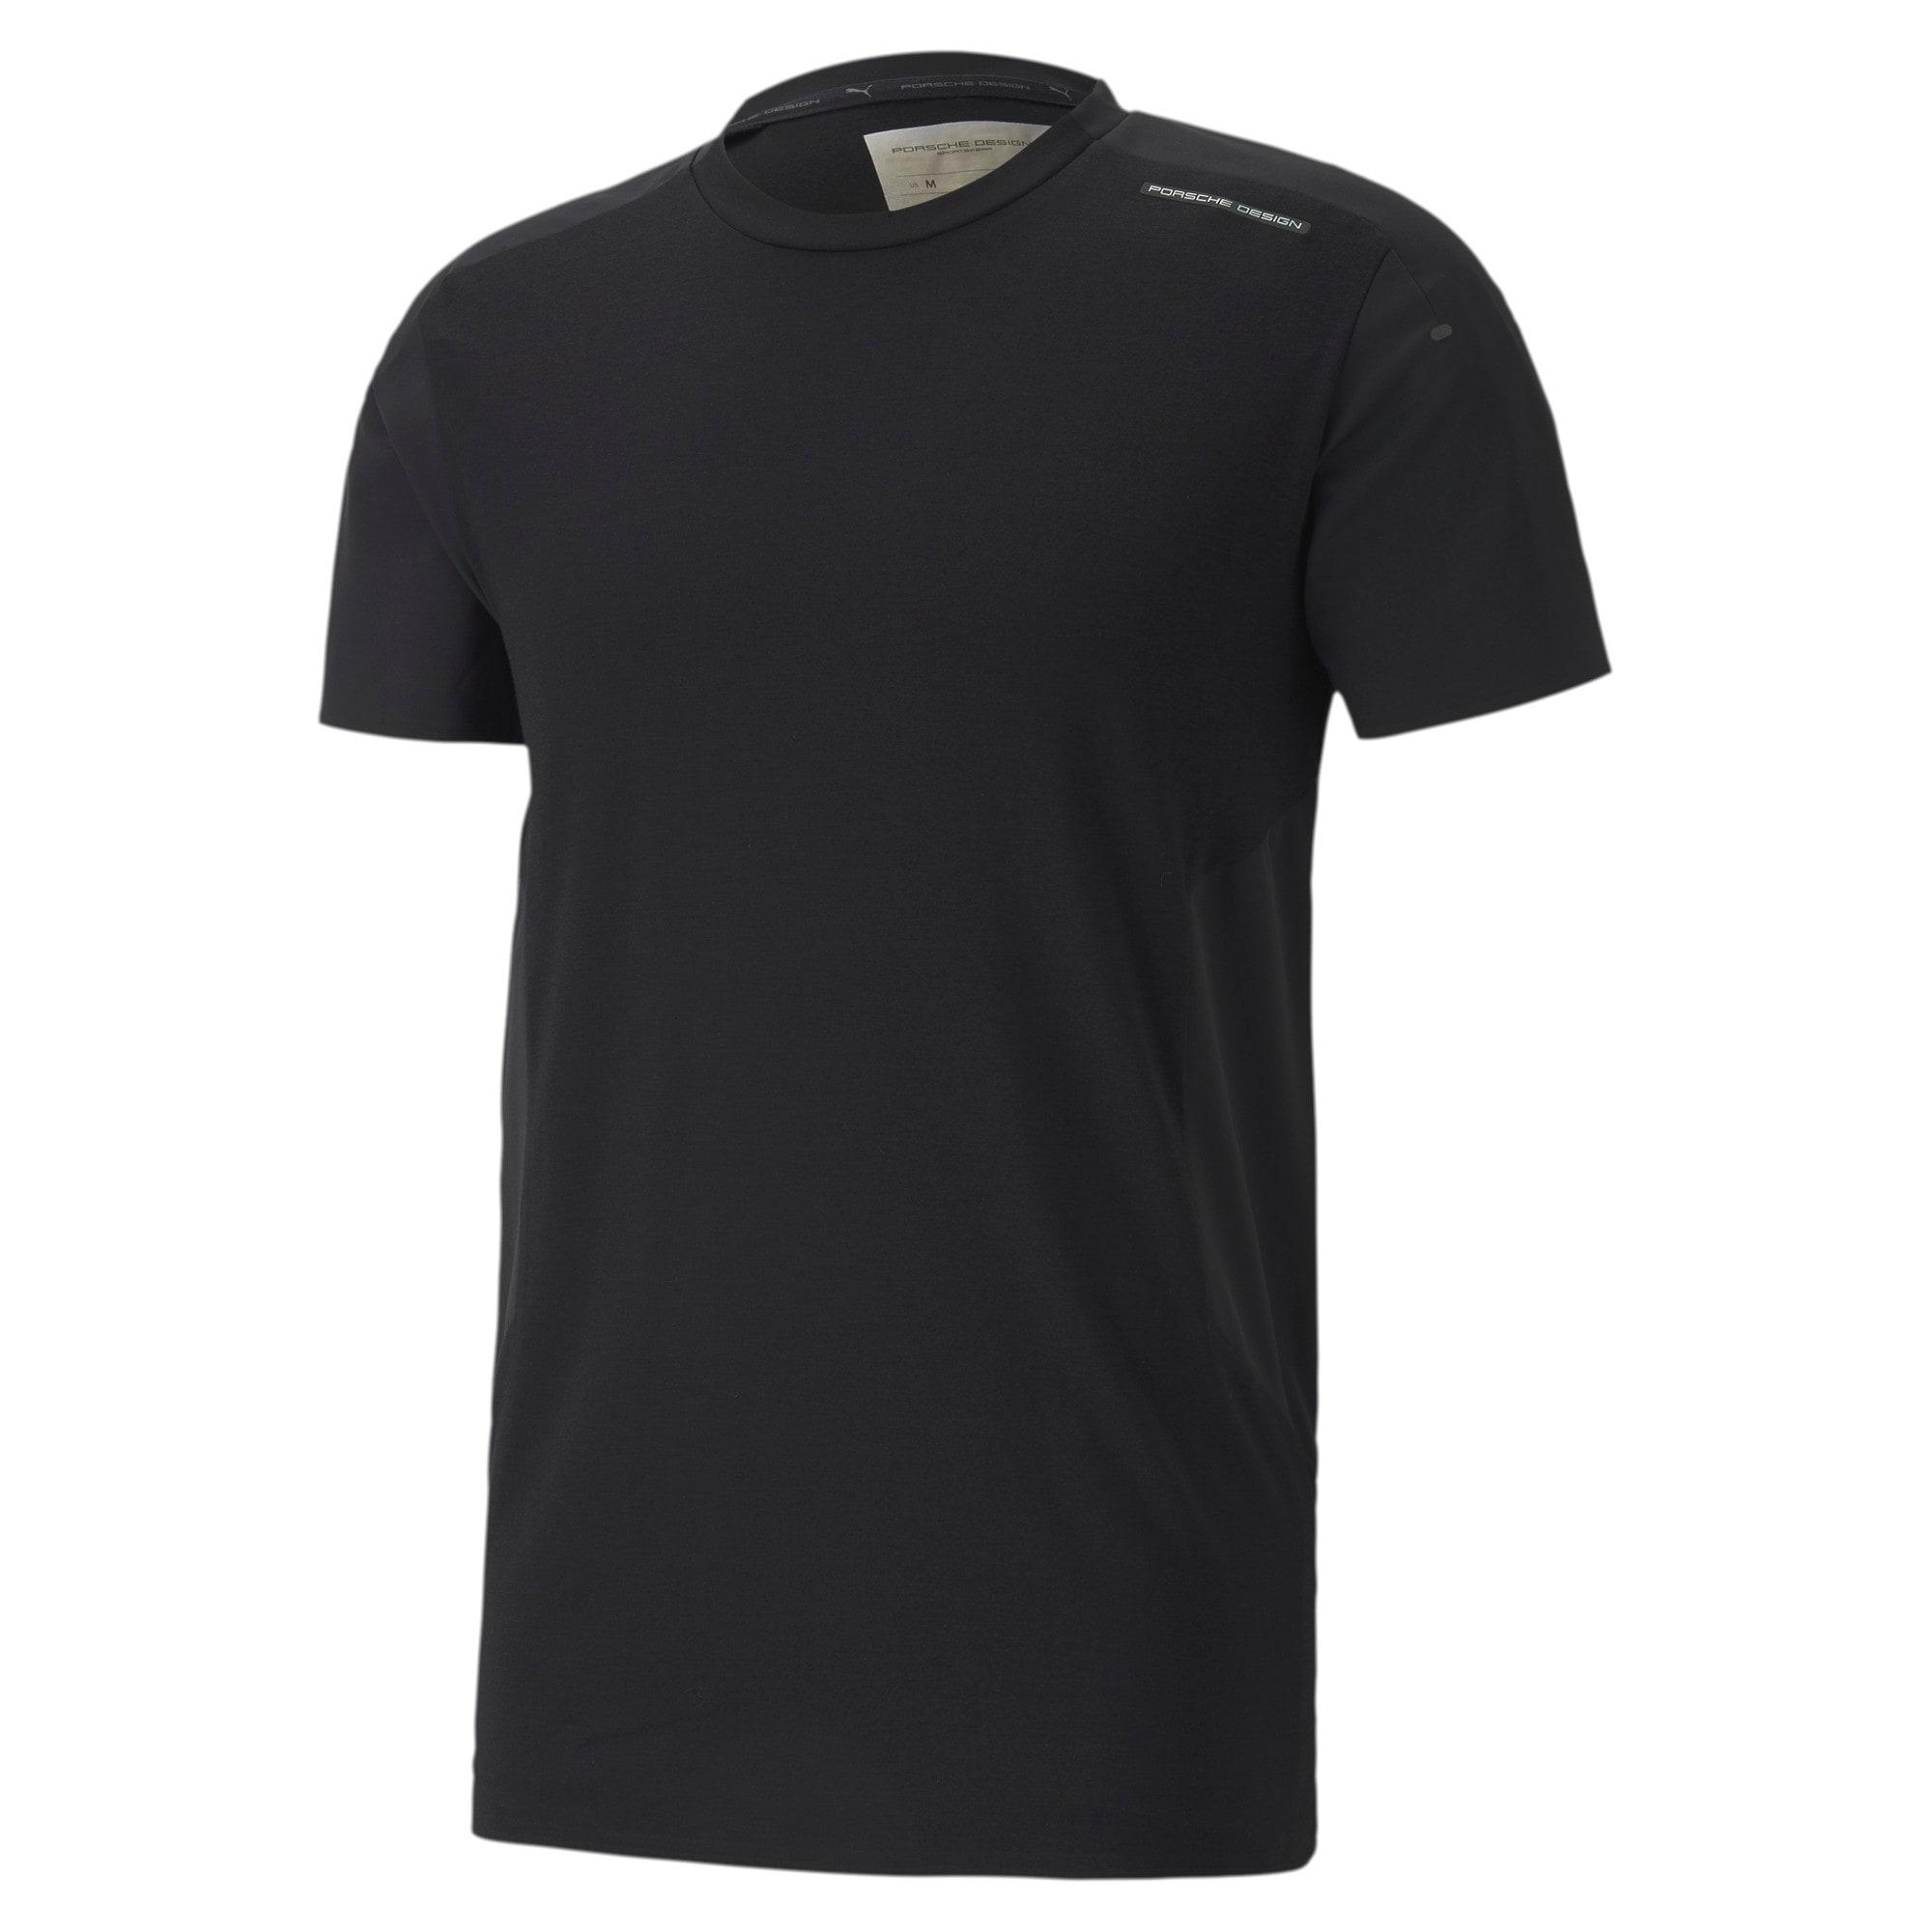 Miniatura 4 de Camiseta Porsche Design RCT para hombre, Jet Black, mediano